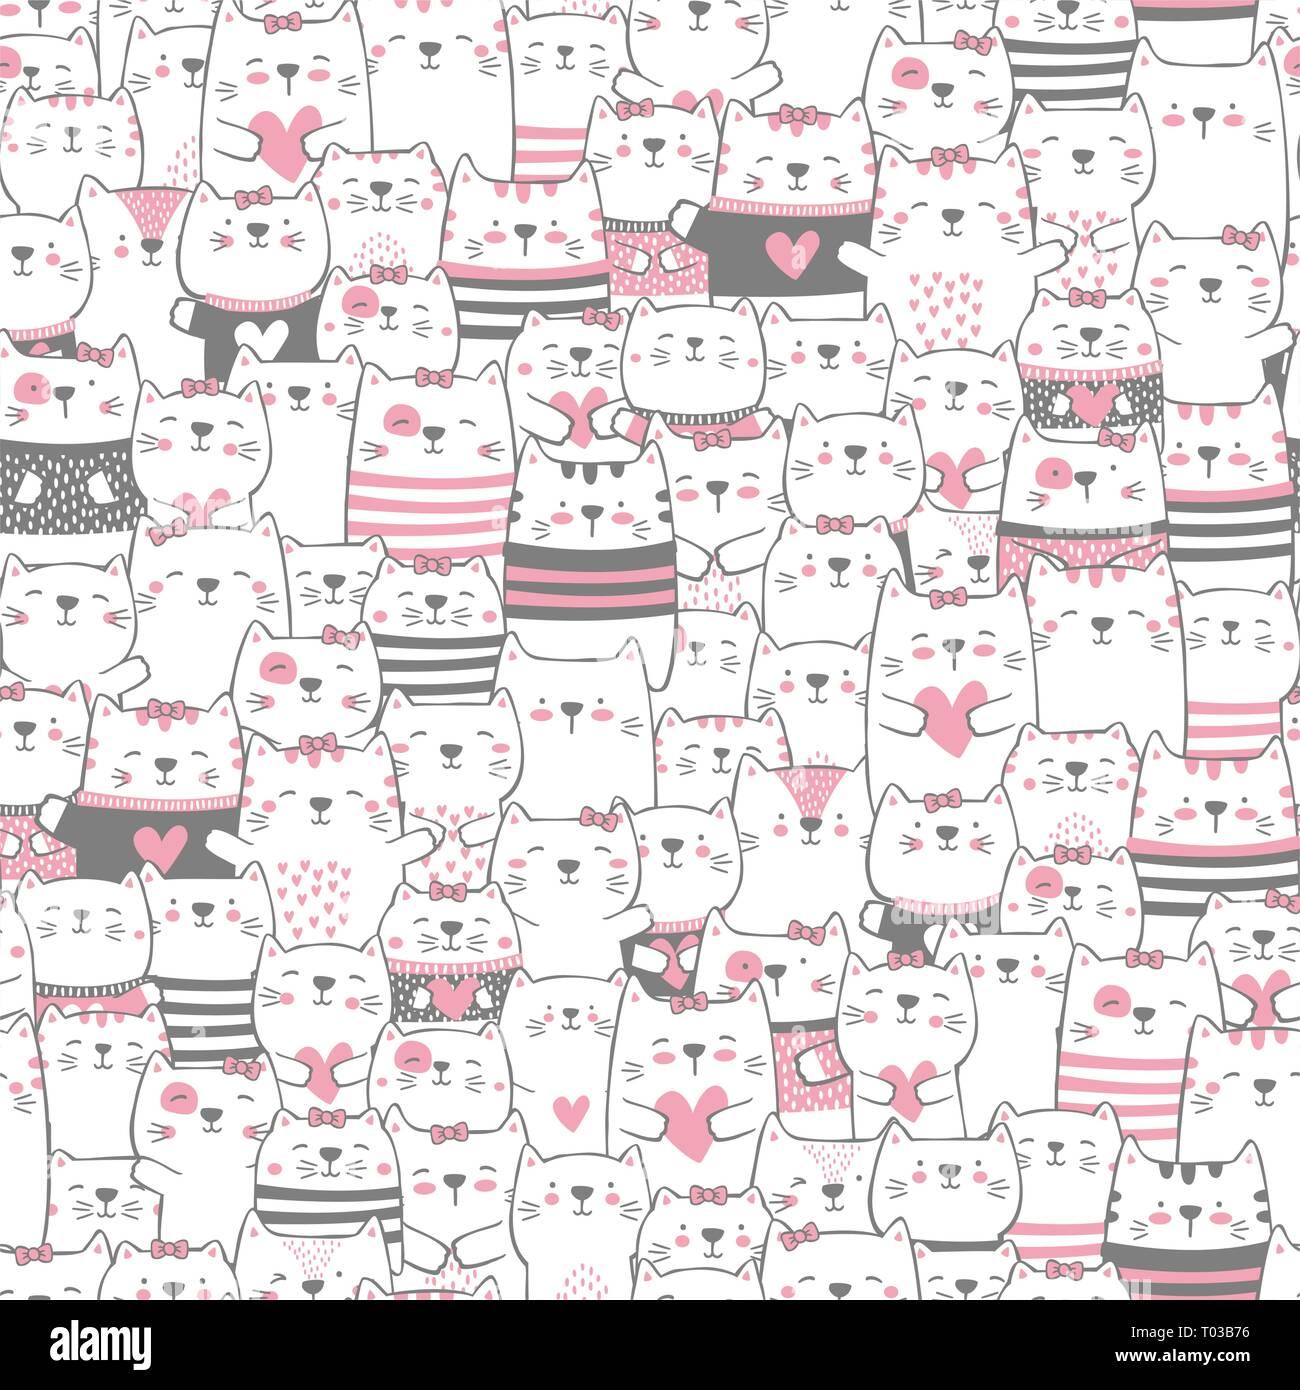 Cute Cats Seamless Pattern Style Moderne A La Main Design